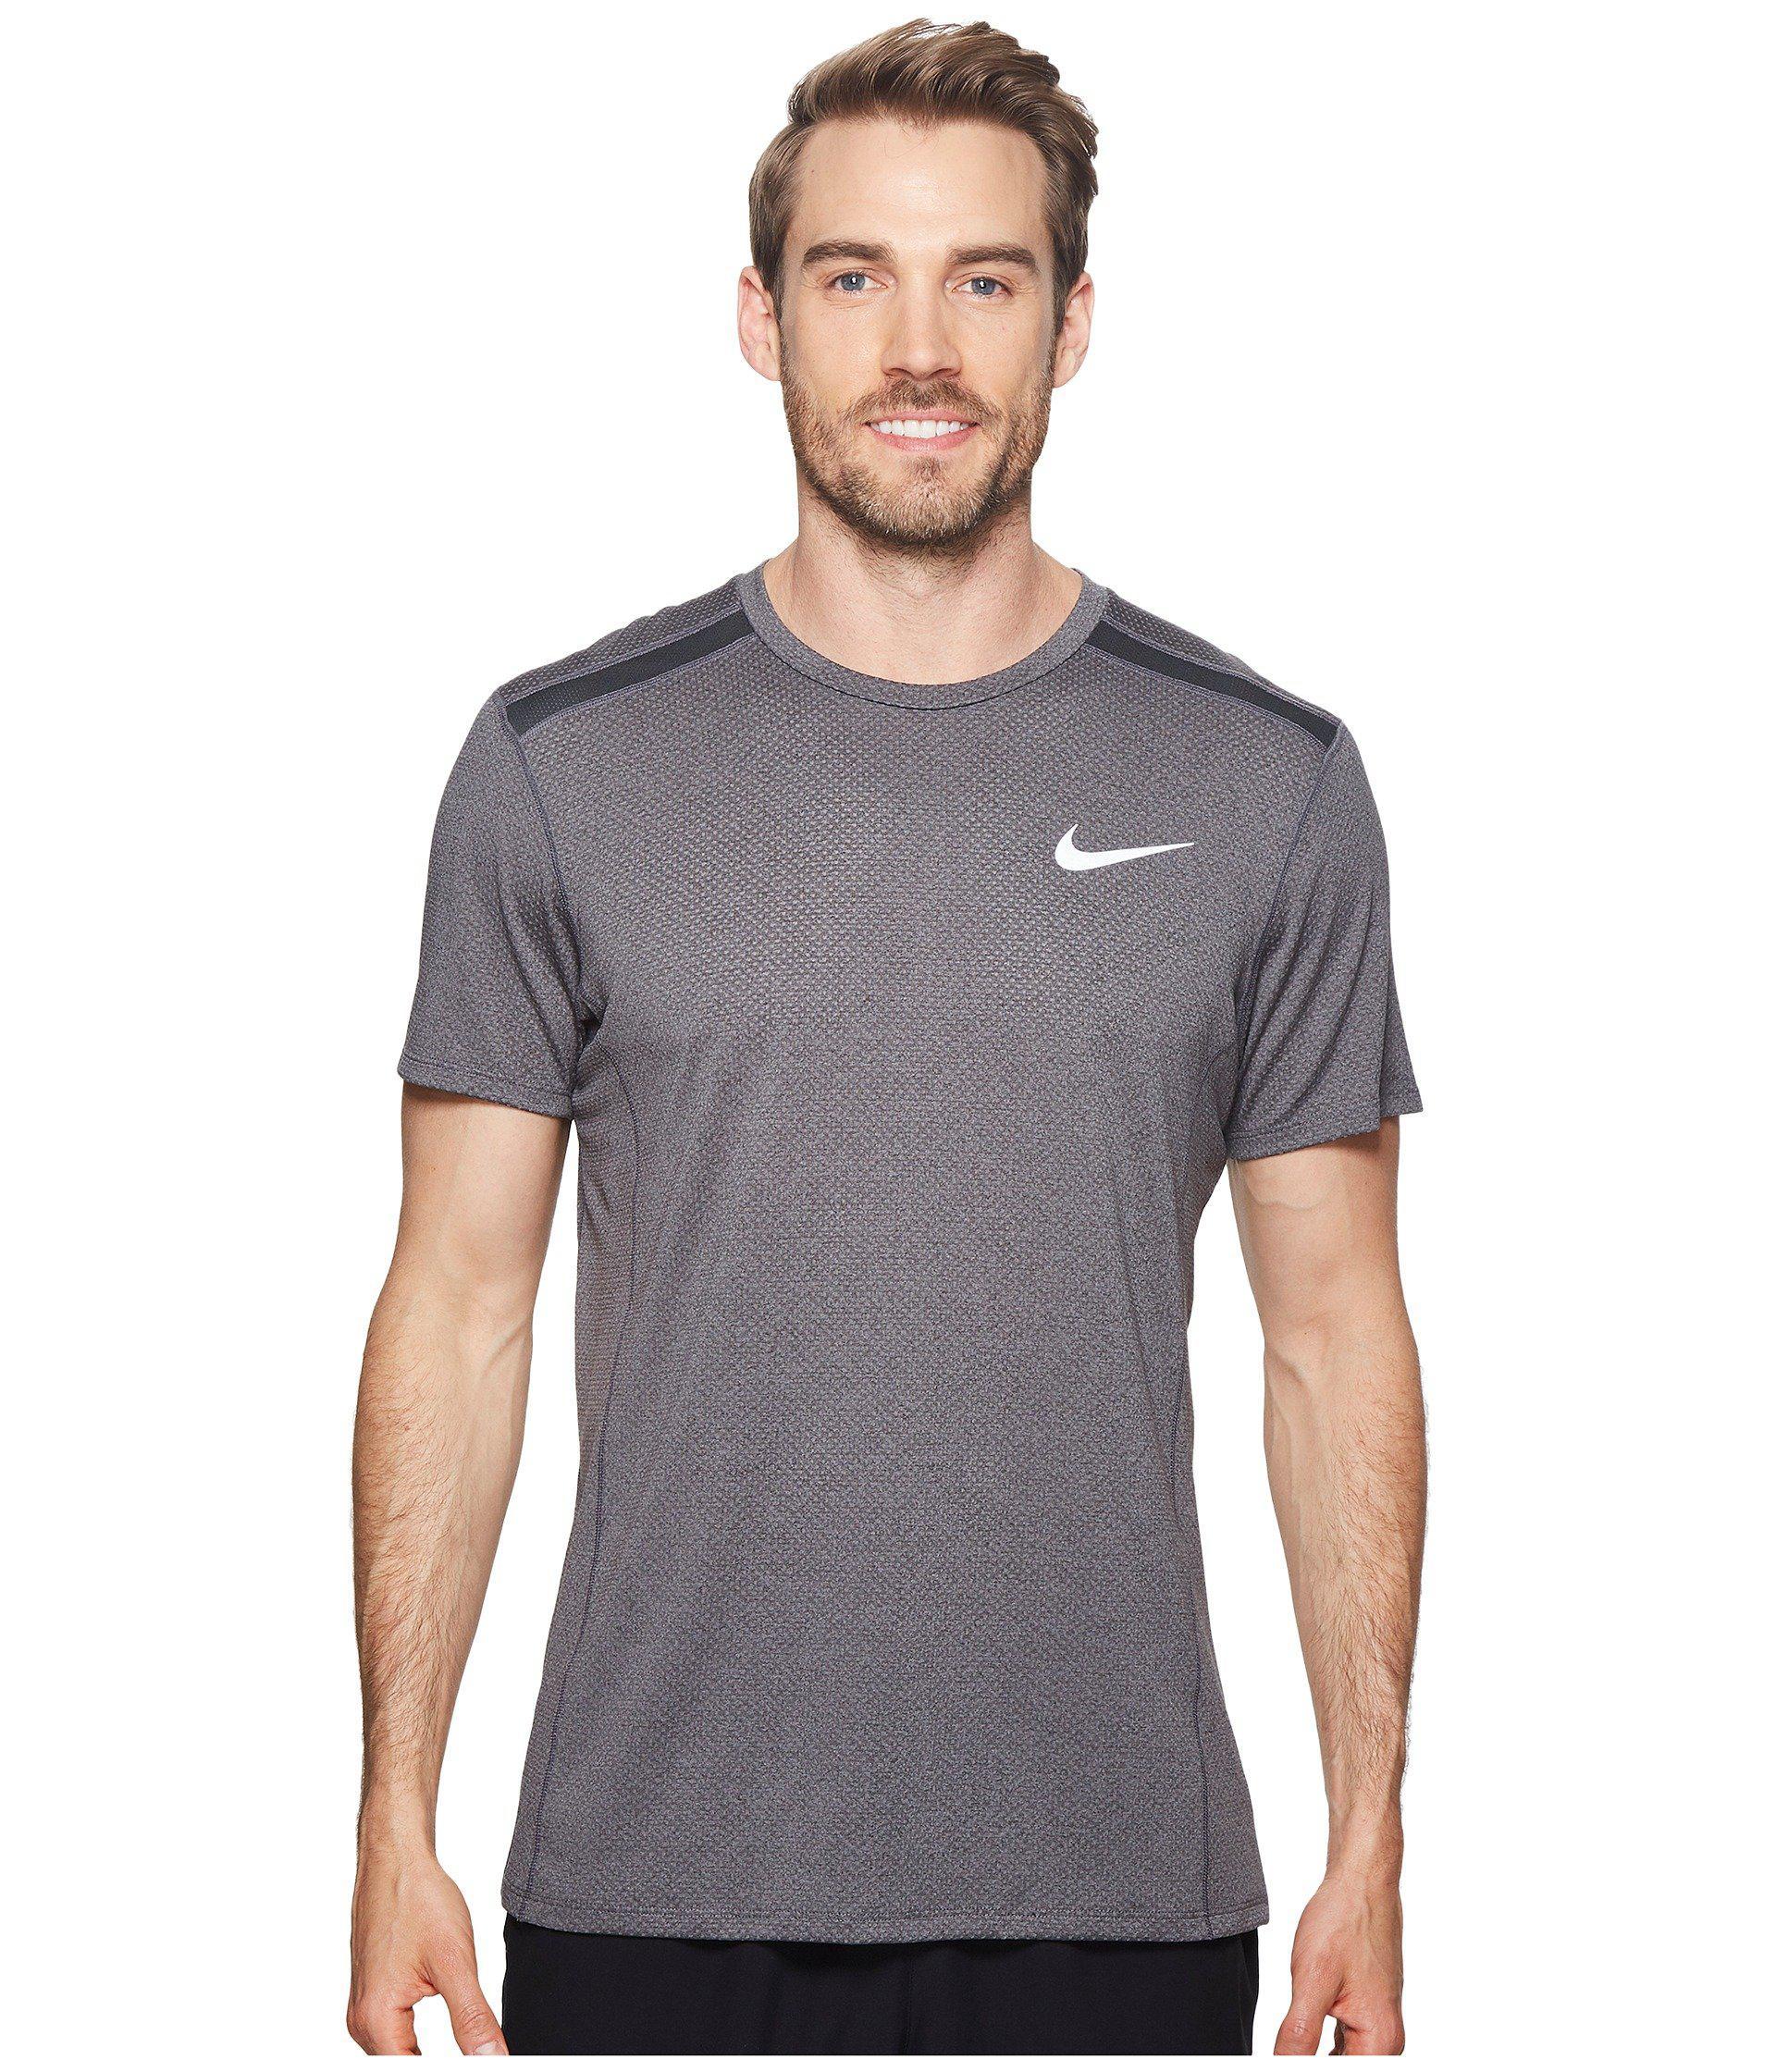 a391c65b2e735 Lyst - Nike Cool Miler Short-sleeve Running Top in Gray for Men ...